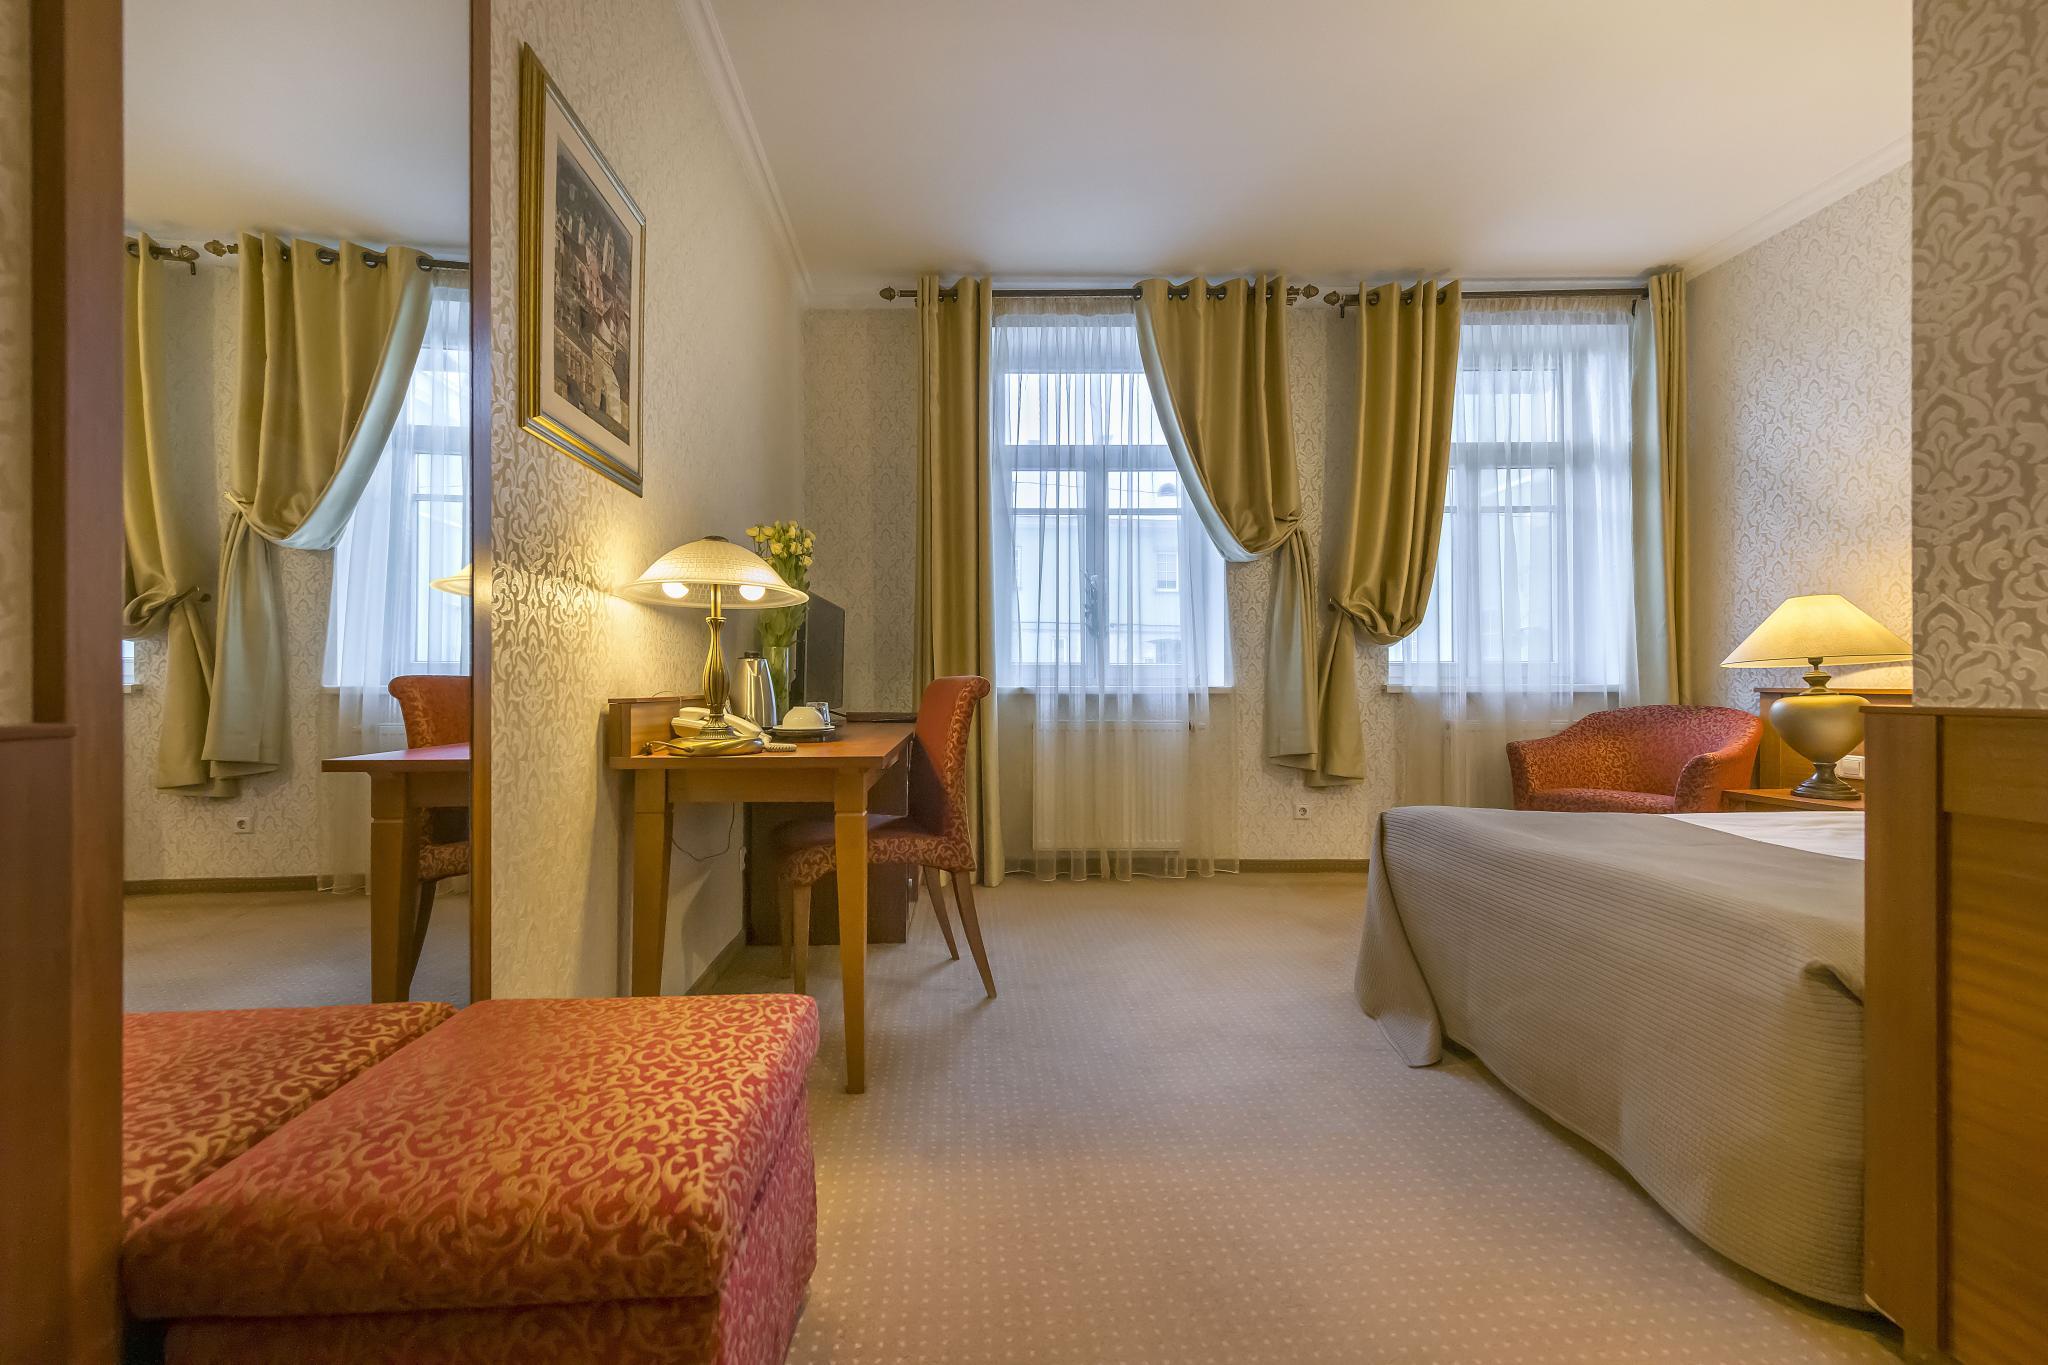 Artis Hotel Standard Double Room